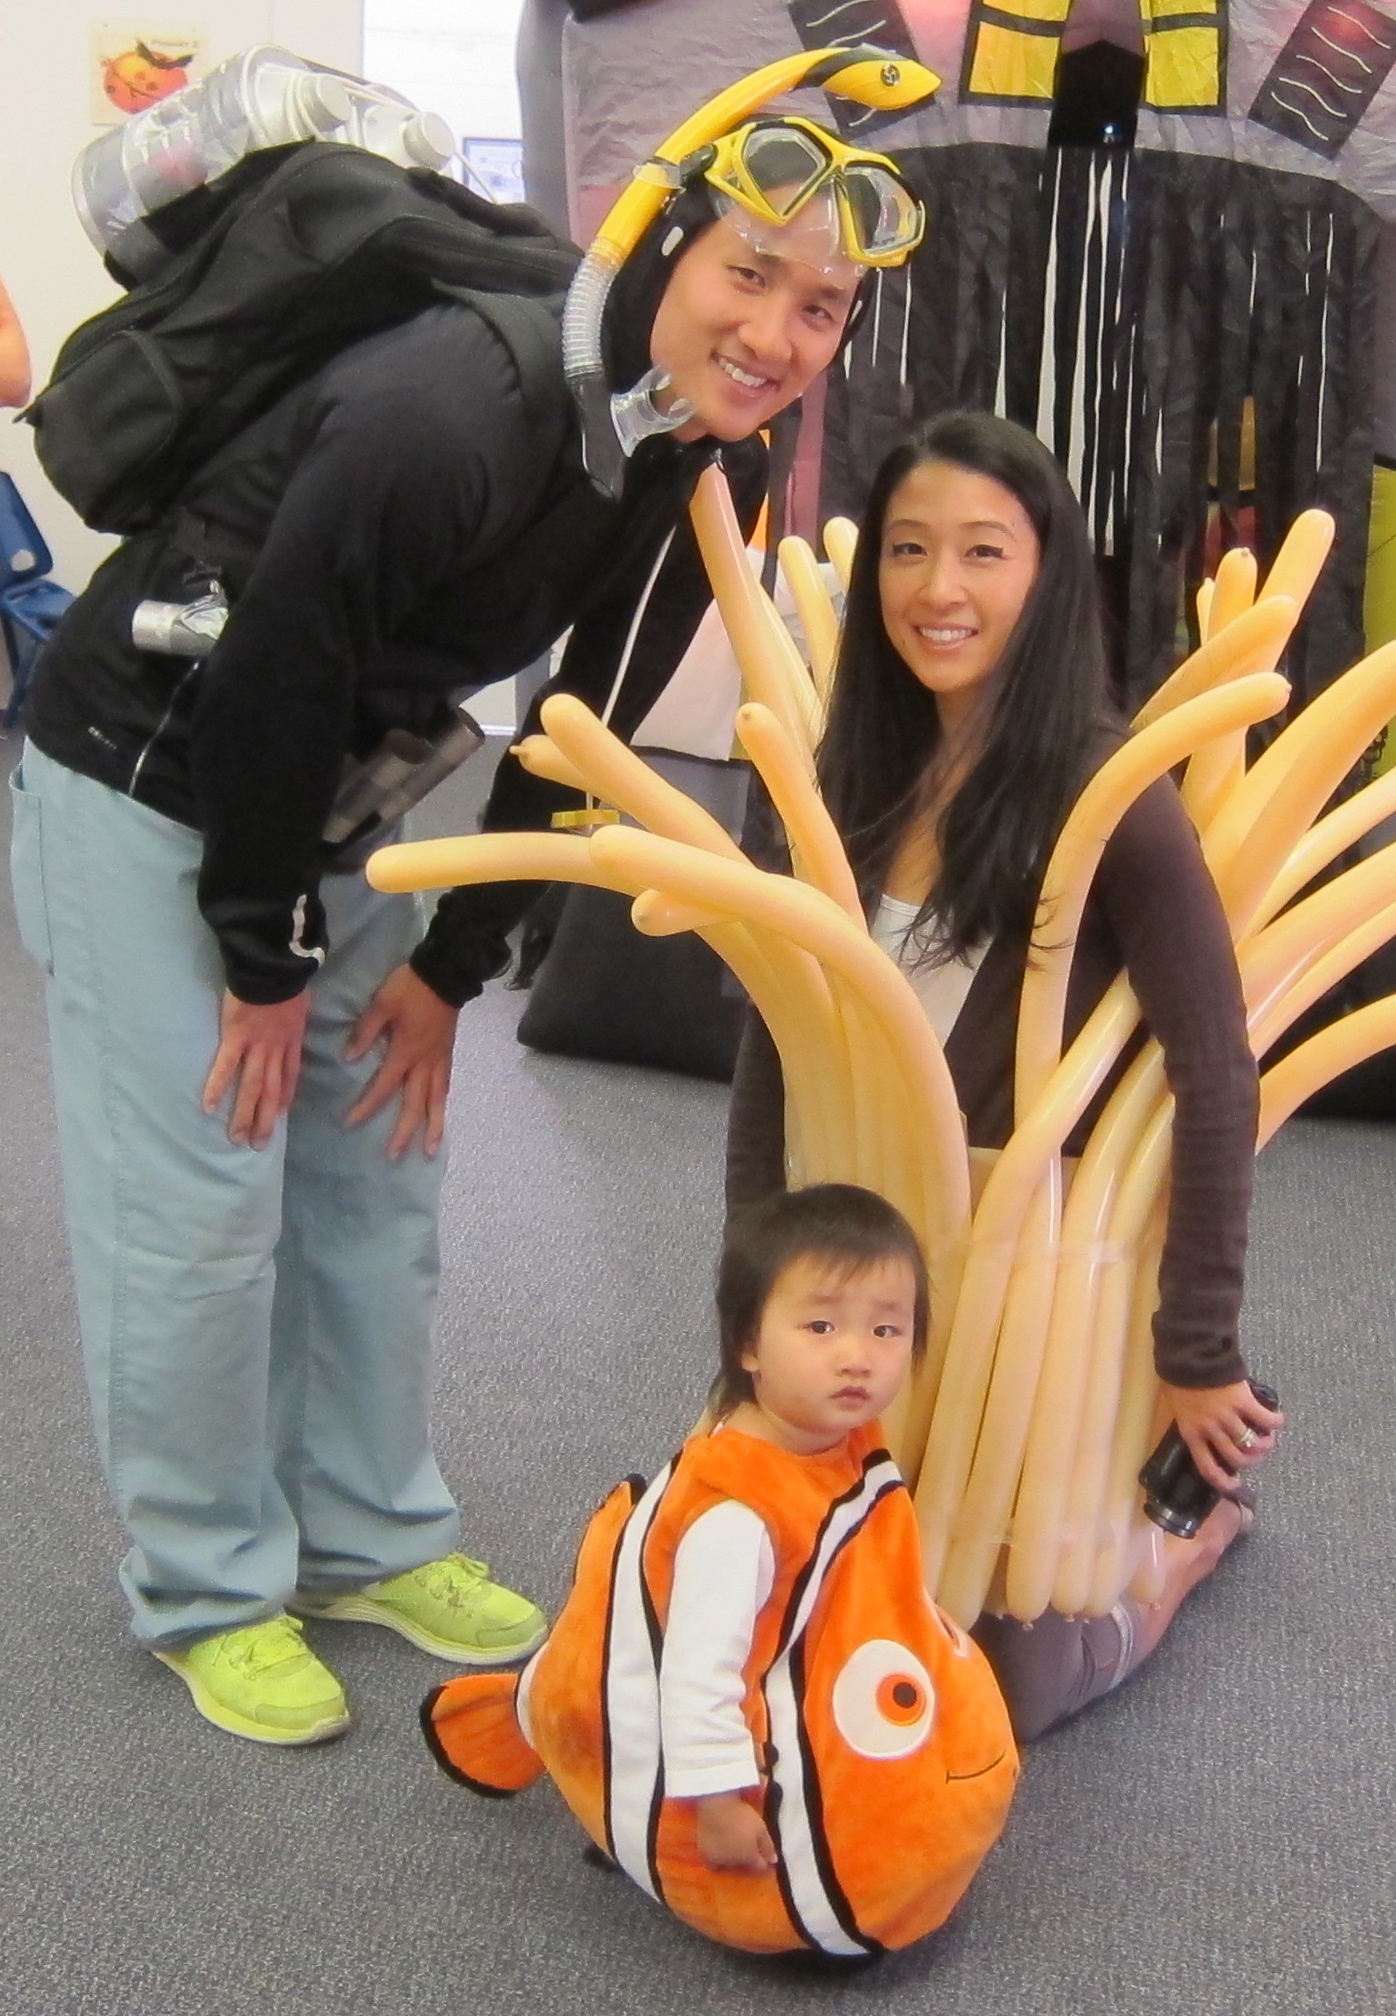 Halloween Family Costume 2013: Finding Nemo | Grace Ling Yu